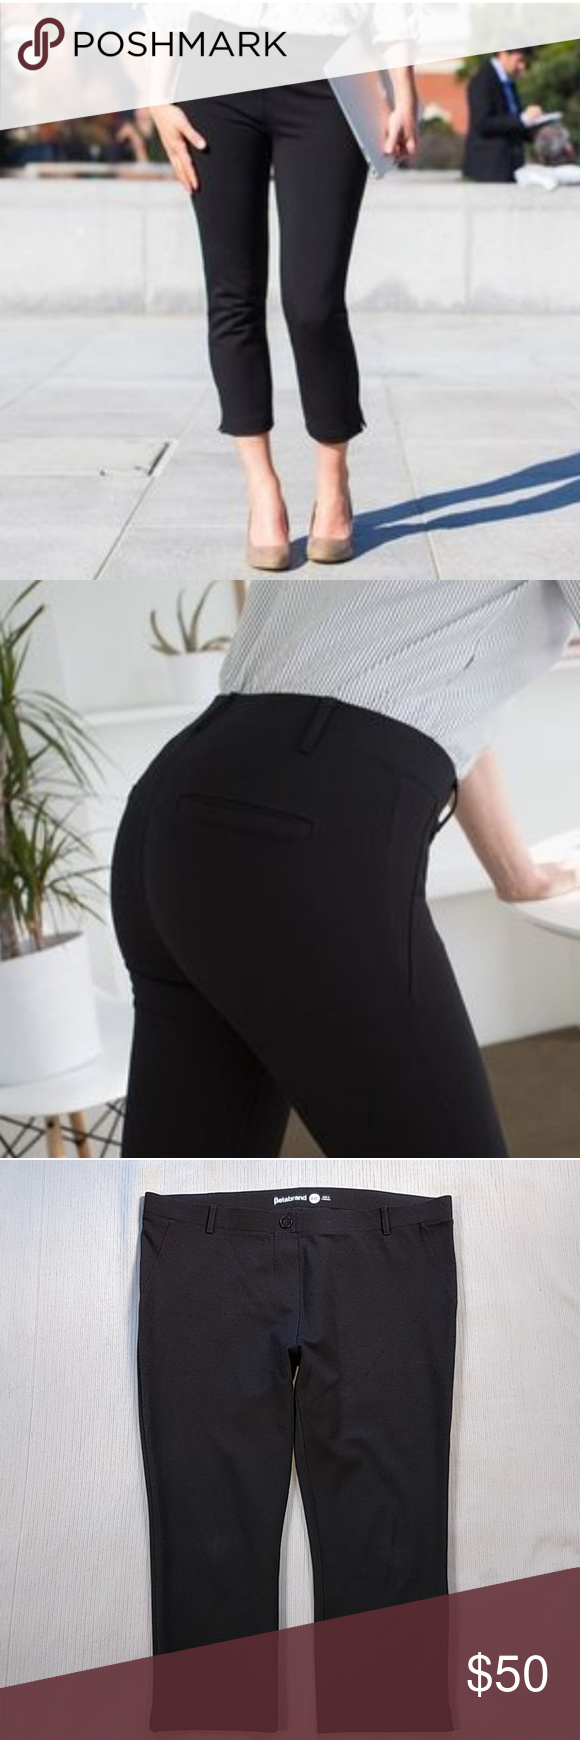 82a239c959a01 Betabrand Crop Dress Pants Yoga Pants Black XXL Betabrand Crop Dress Pants  Yoga Pants Black.